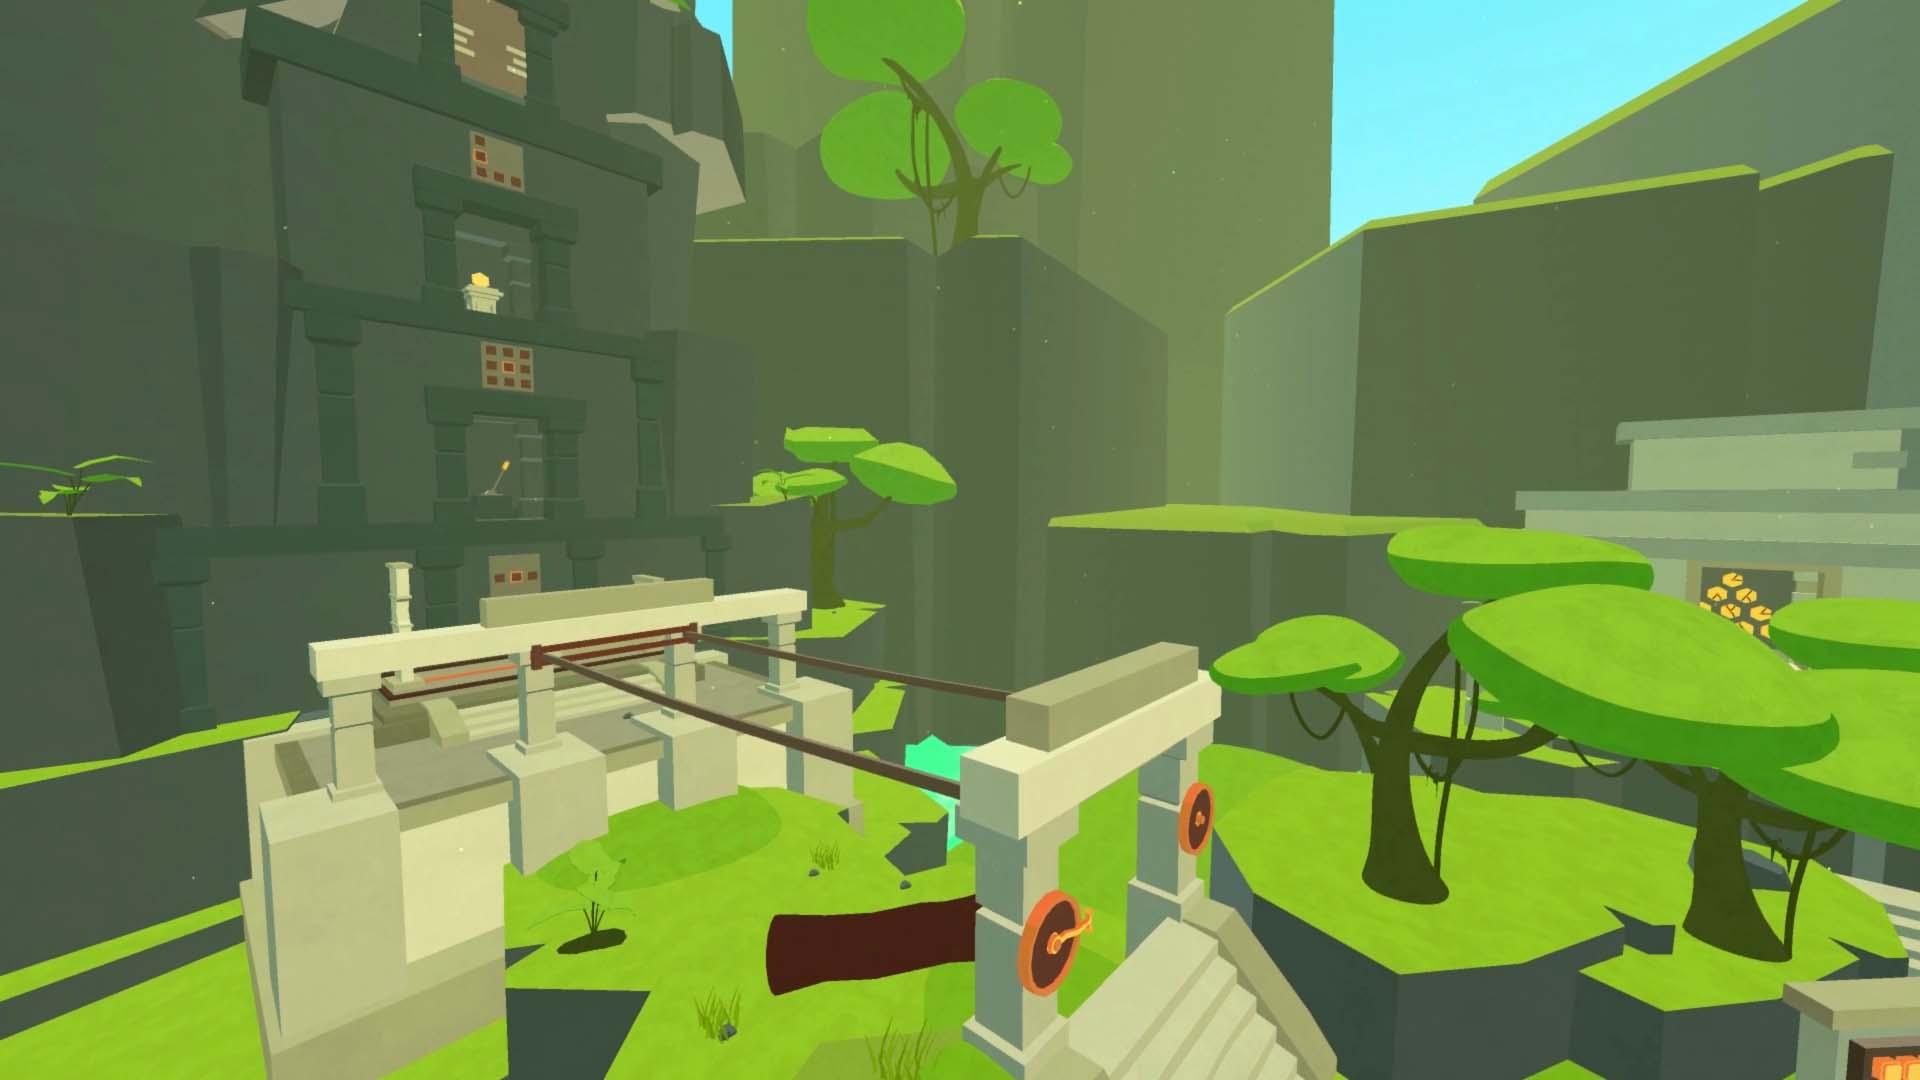 Faraway 2 Mobile Game Trailer